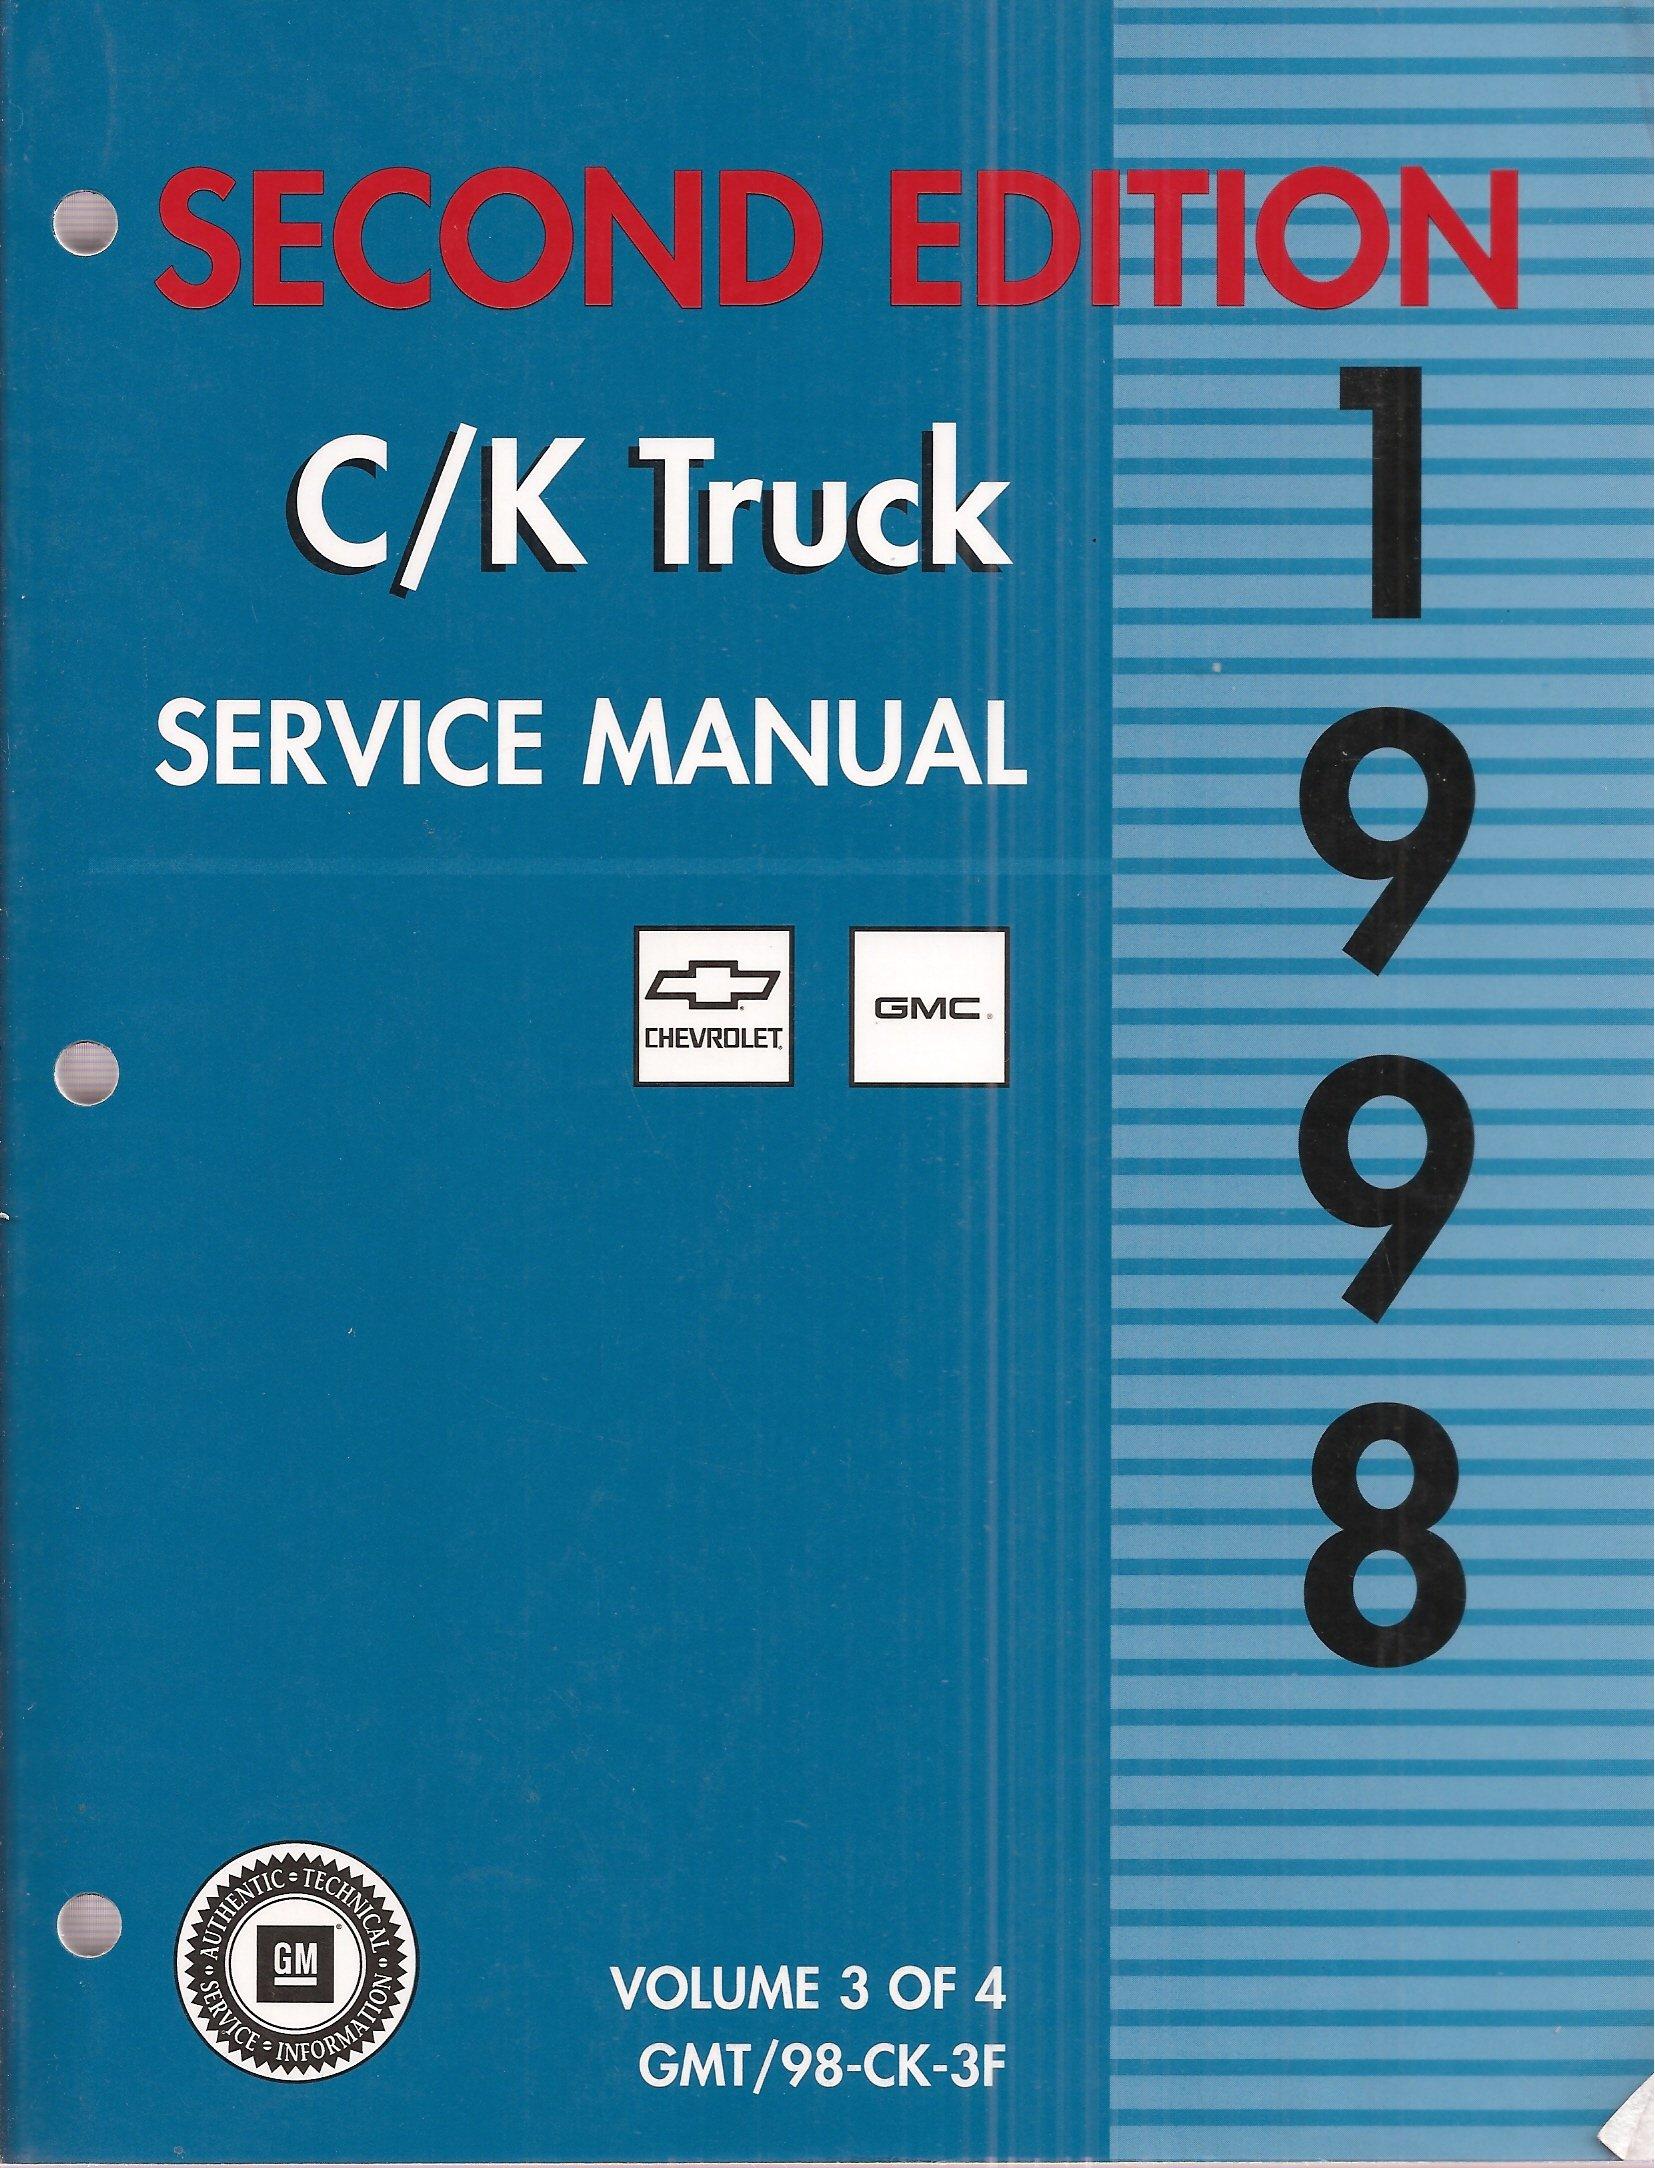 1998 Chevrolet and GMC C/K Truck Service Manual, Second Edition, Volume 3:  Unknown: Amazon.com: Books